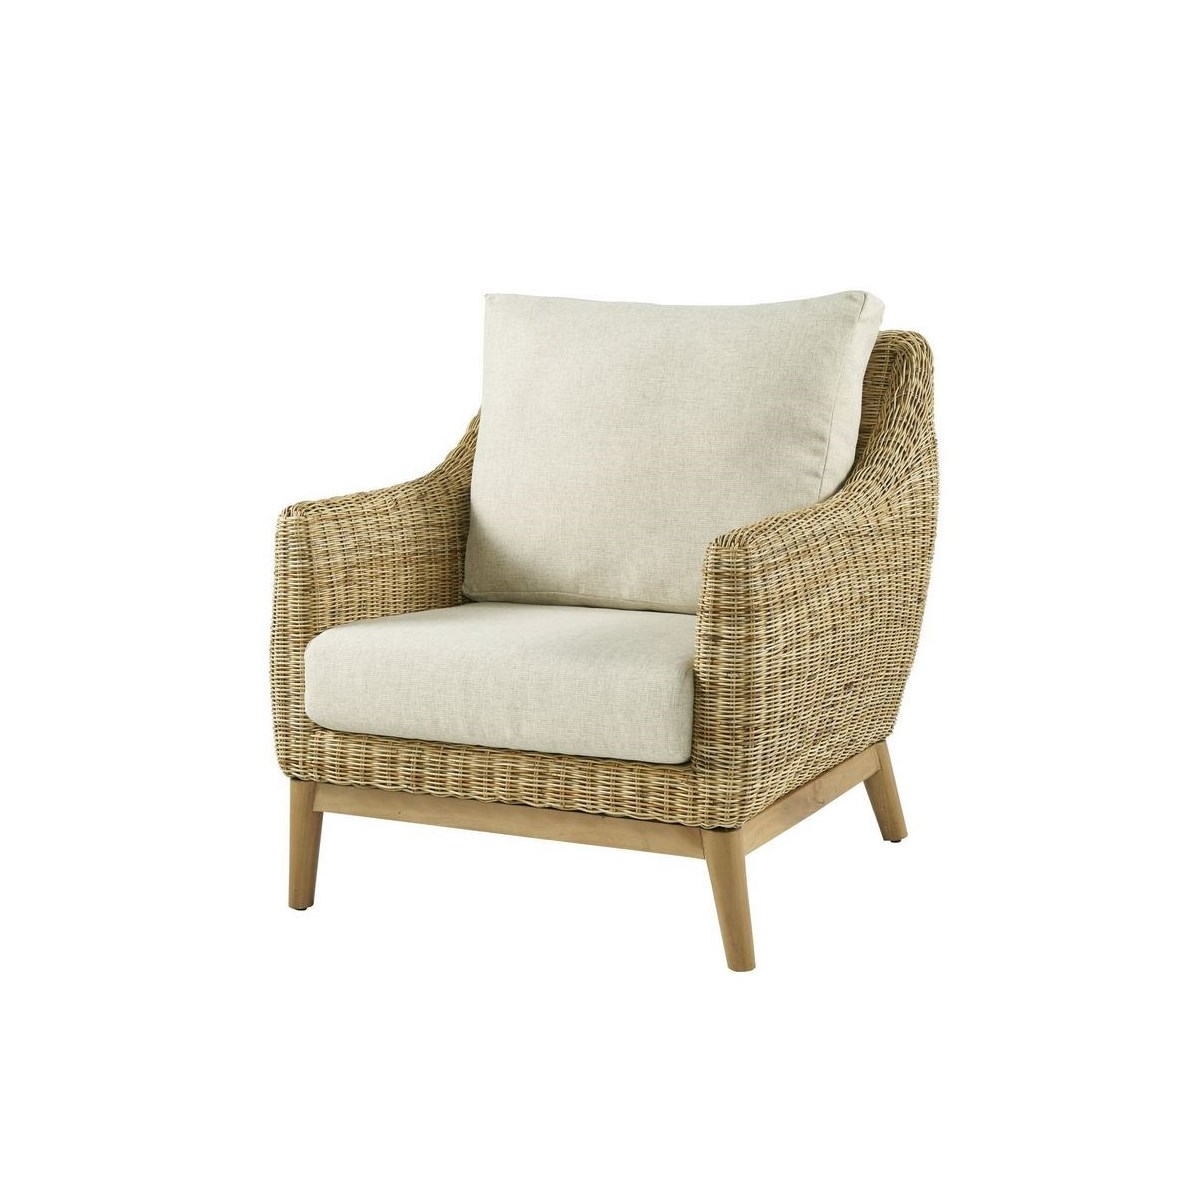 Metropolitan Club Chair Frame Color - Natural Weave Color - Natural  Cushion Color - Cream